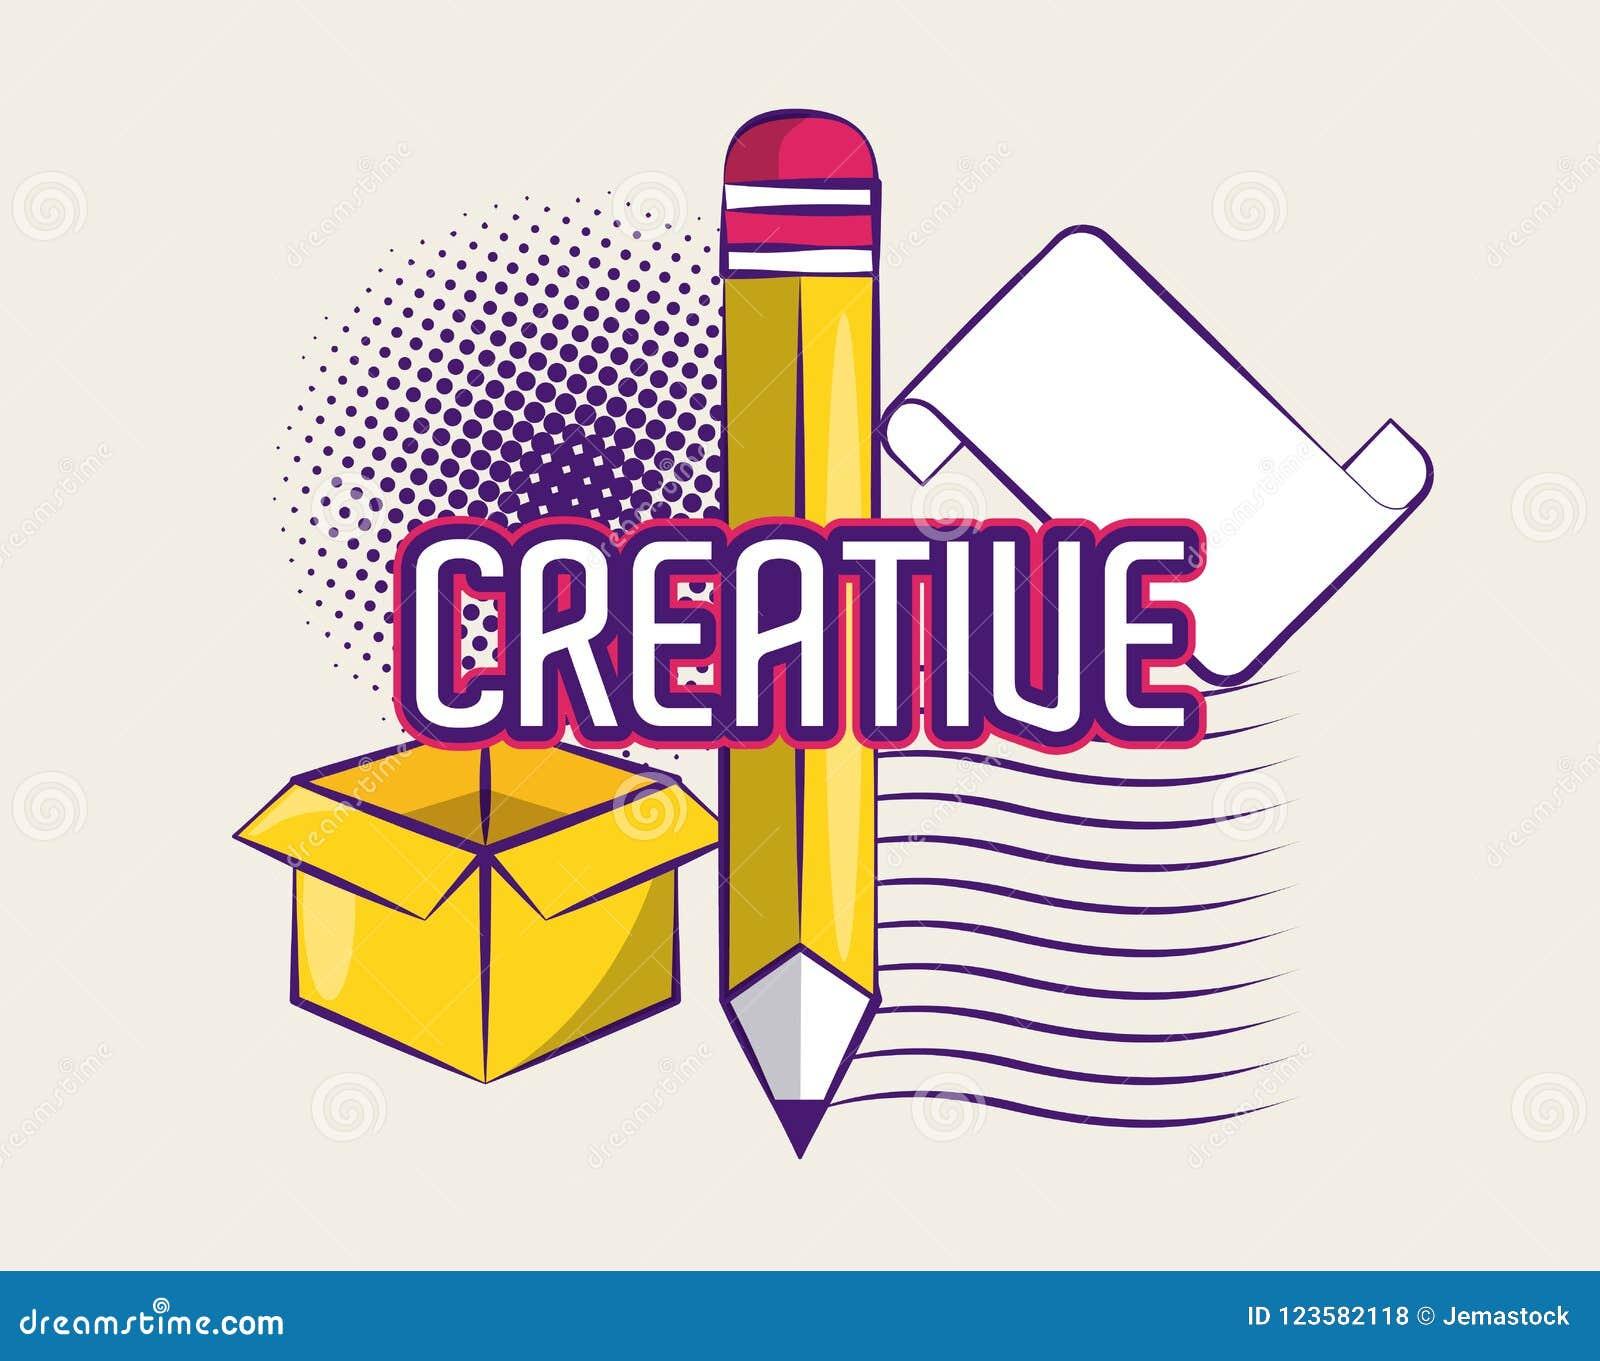 images?q=tbn:ANd9GcQh_l3eQ5xwiPy07kGEXjmjgmBKBRB7H2mRxCGhv1tFWg5c_mWT Trends For Graphic Artist Vector @koolgadgetz.com.info